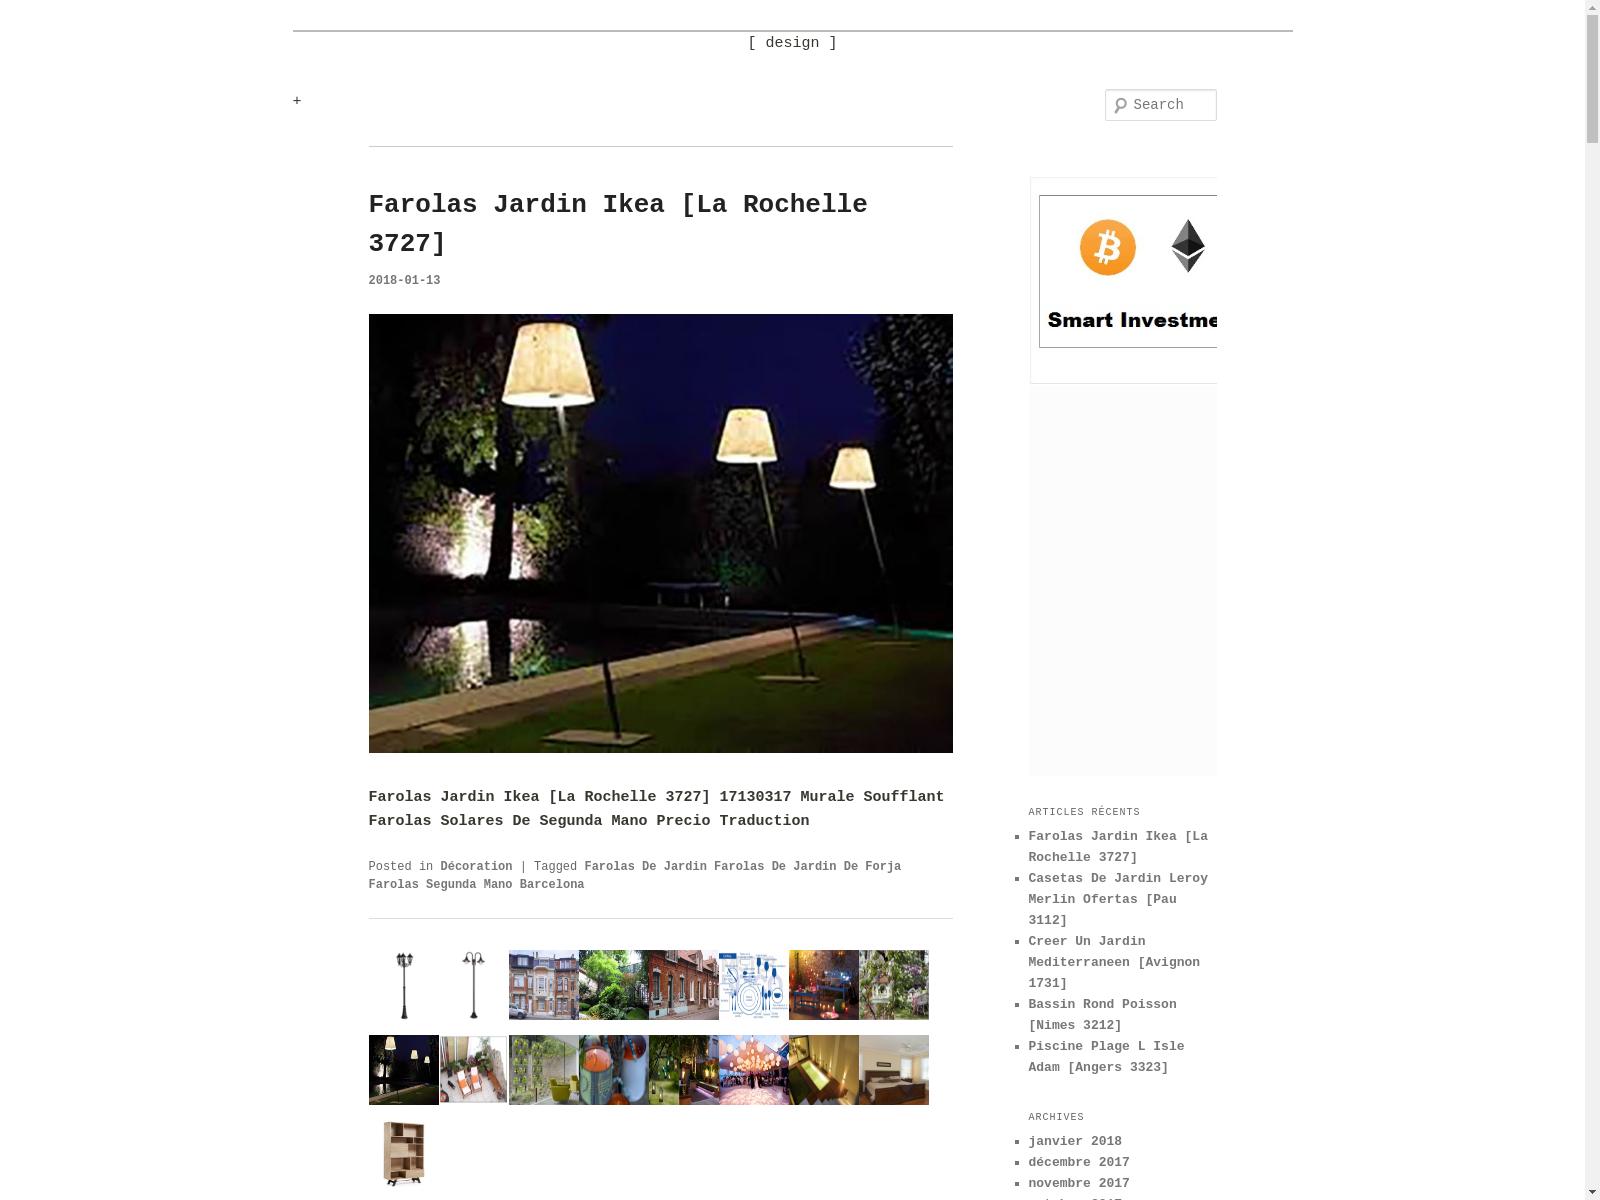 Thebests.us - Urlscan.io dedans Banc De Jardin Ikea